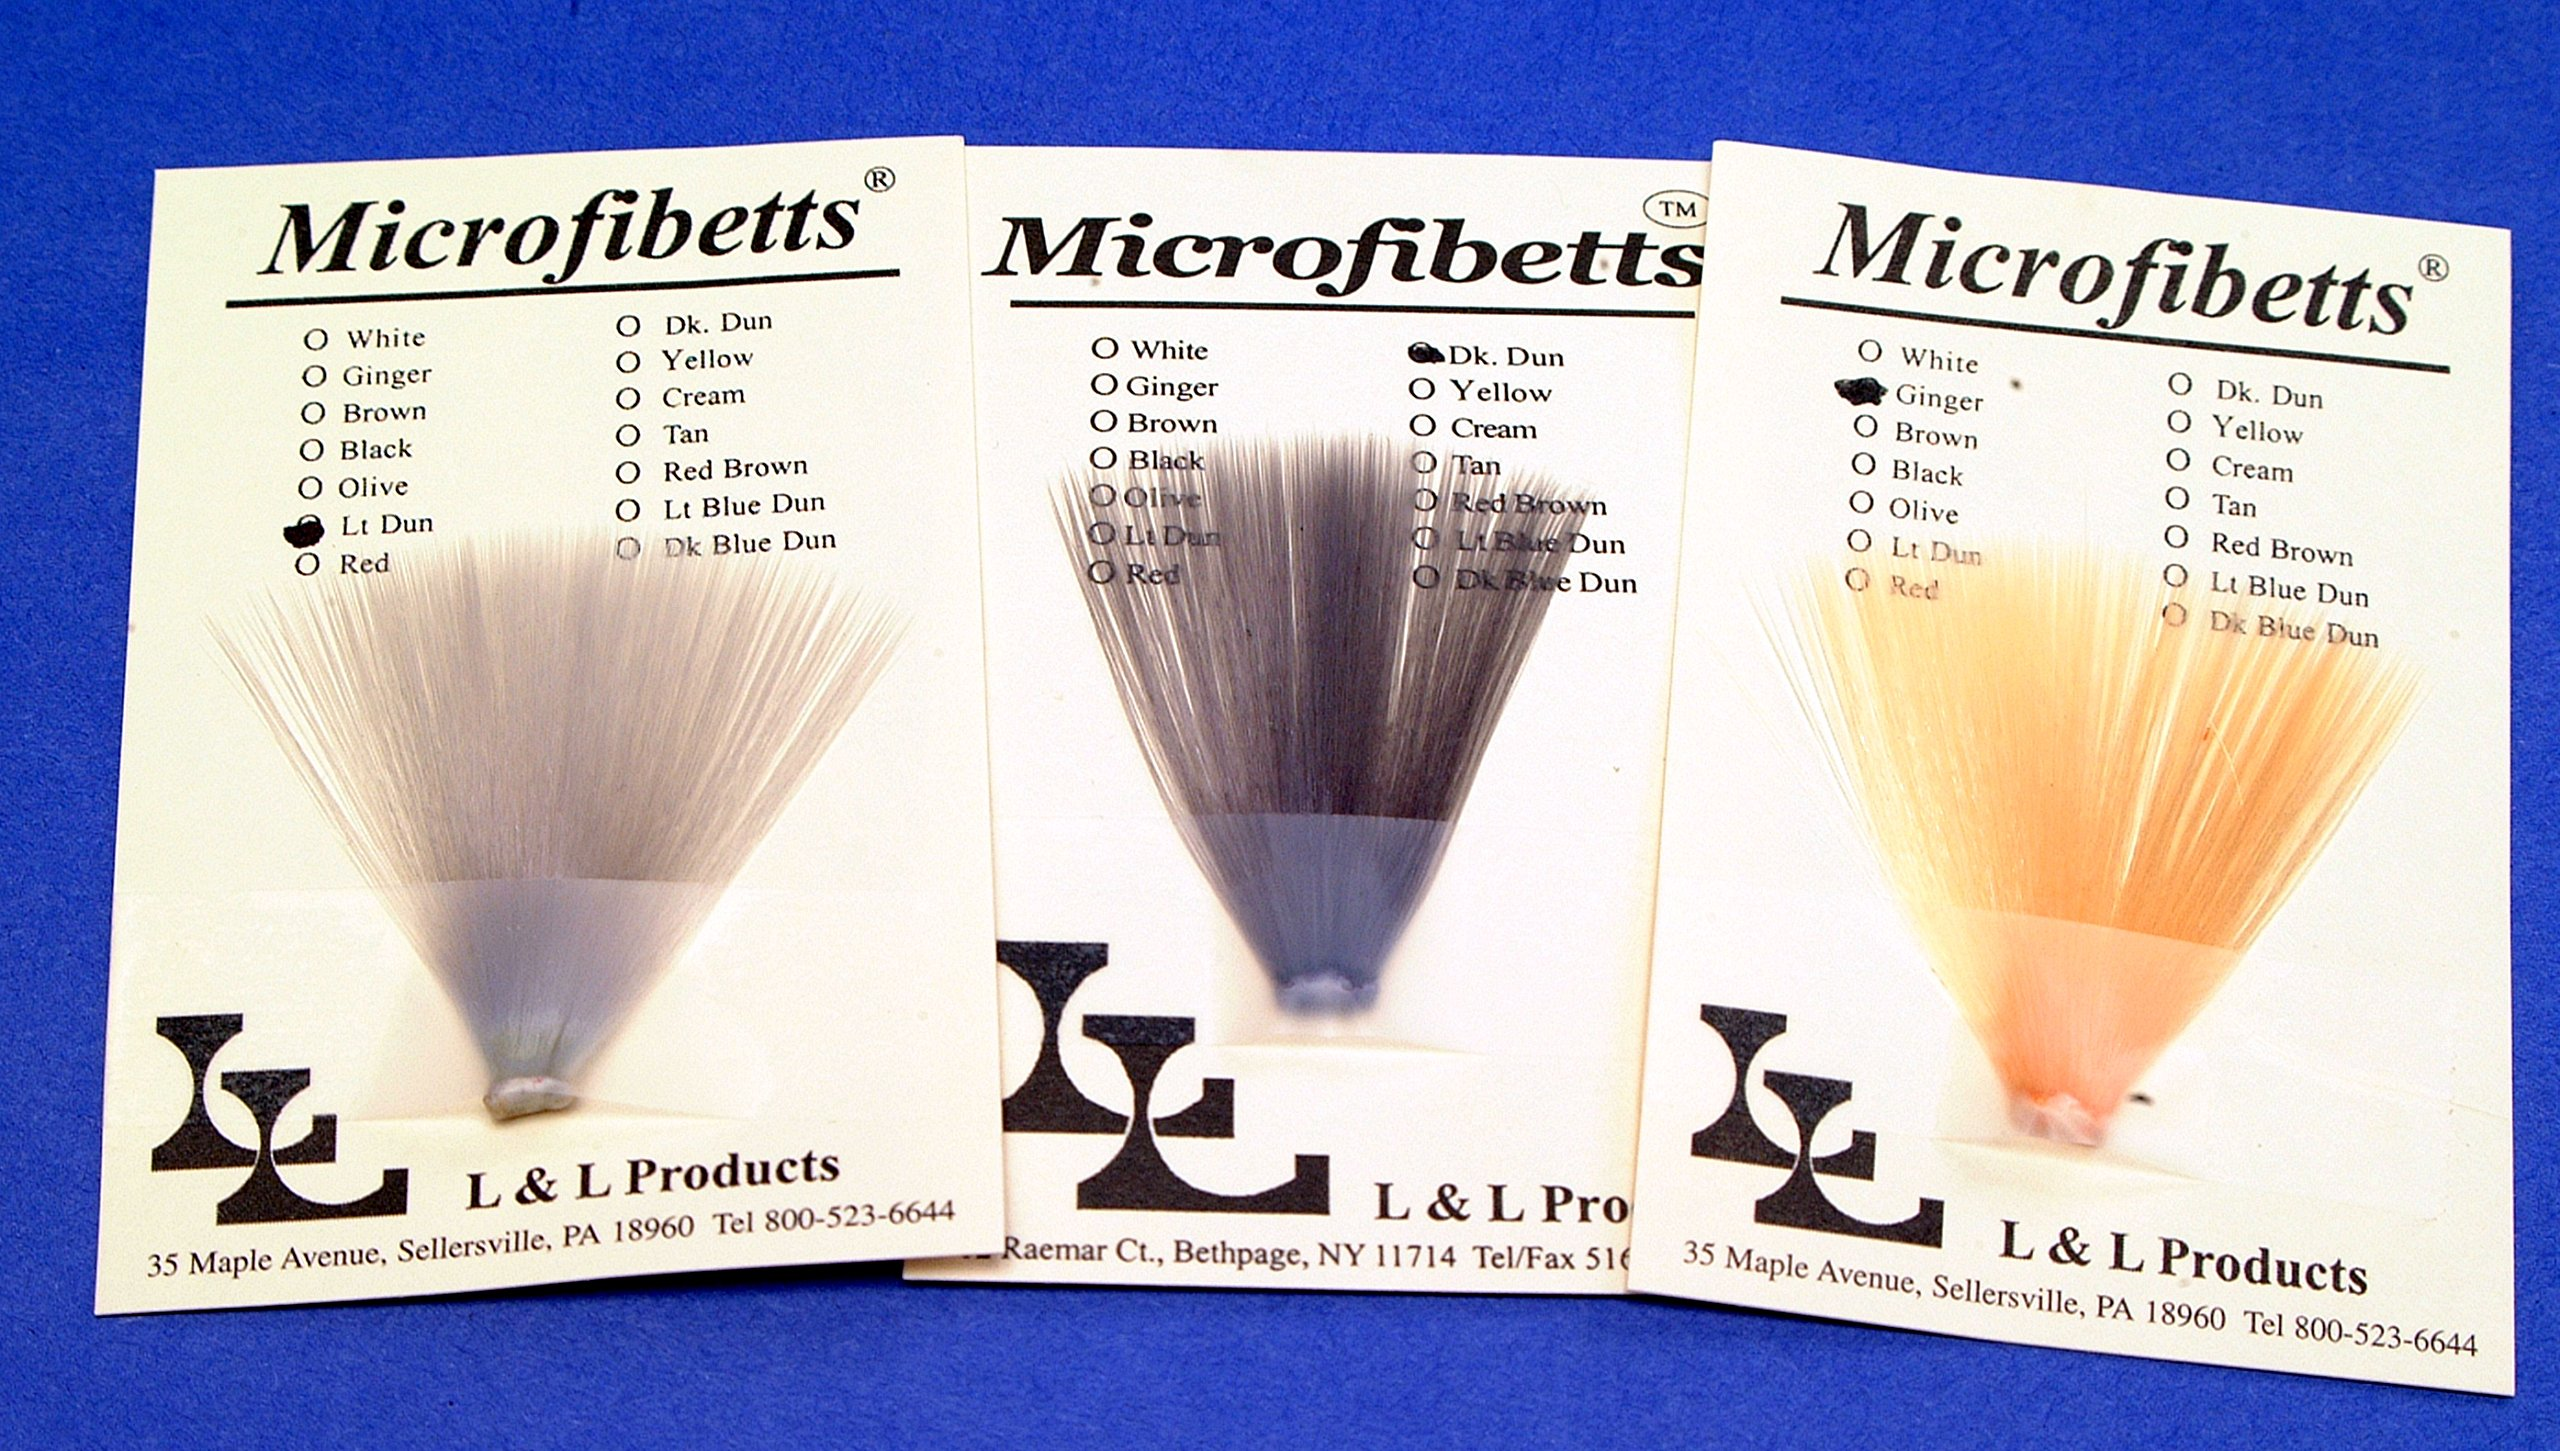 Microfibetts (Brown)